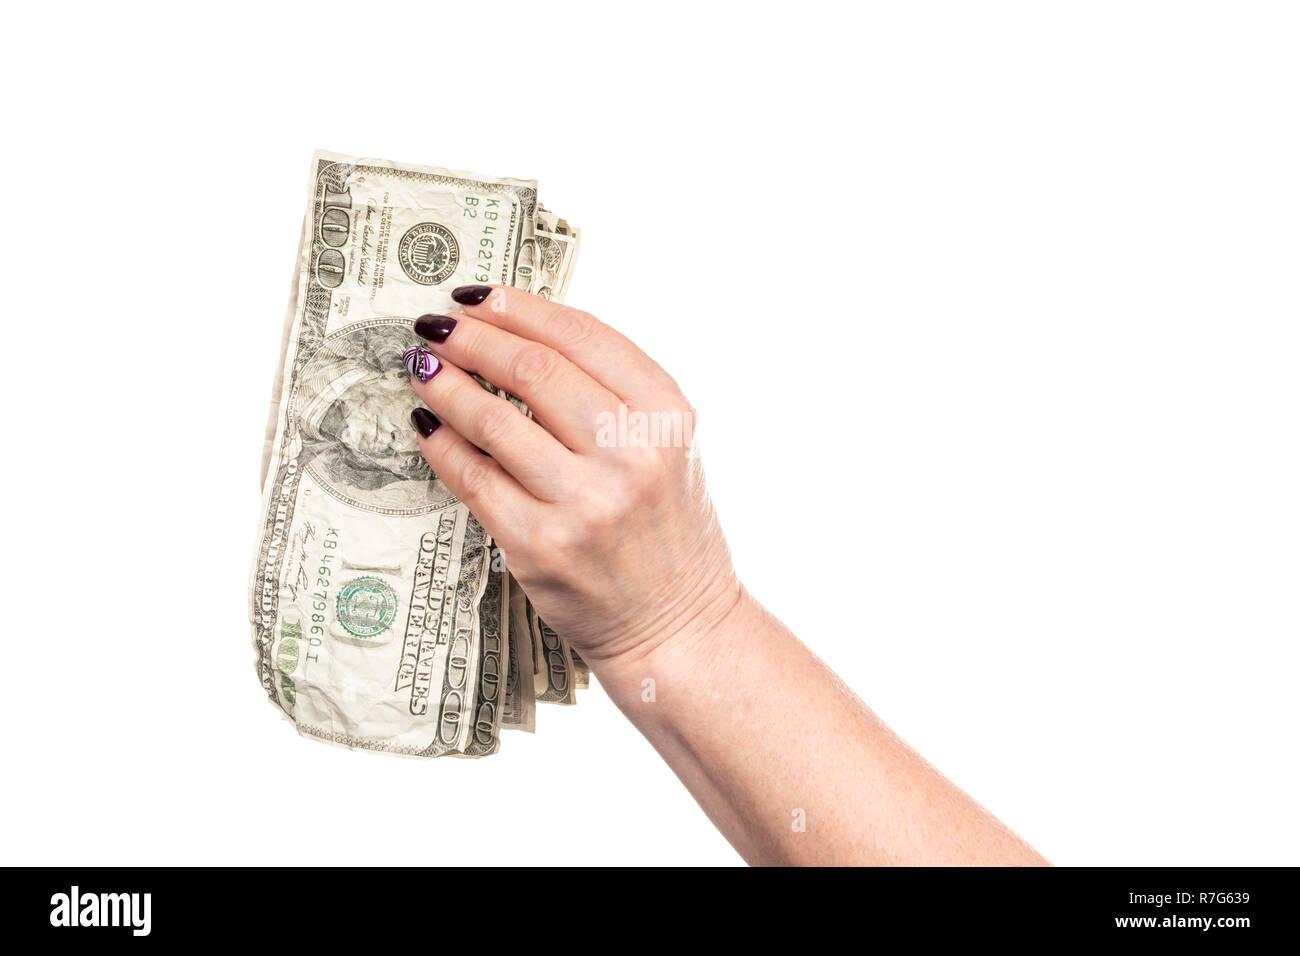 crumpled money in female hand - Stock Image